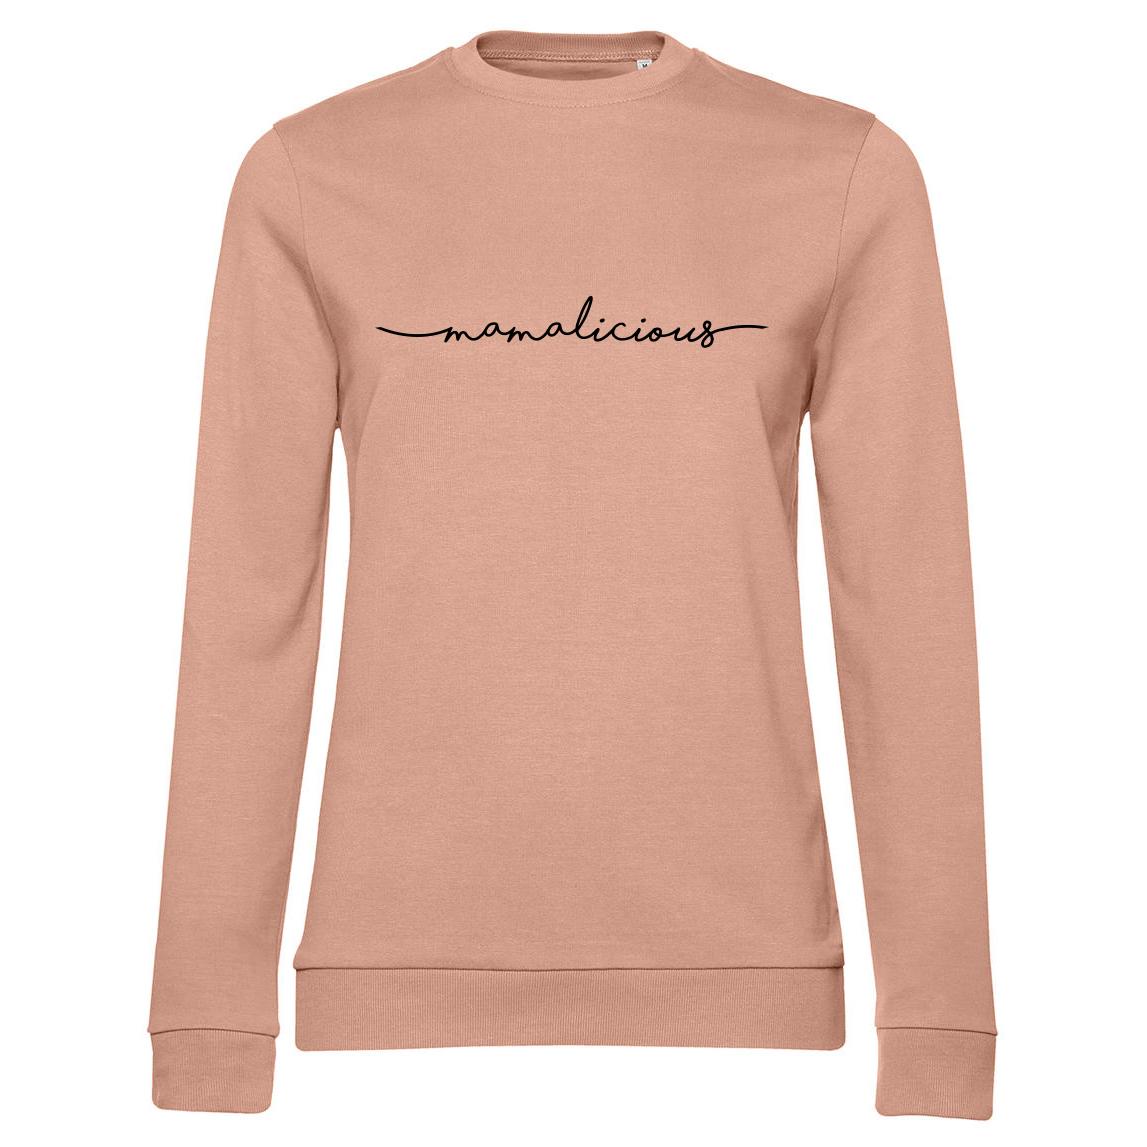 Sweater  - Mamalicious - Summer Edition